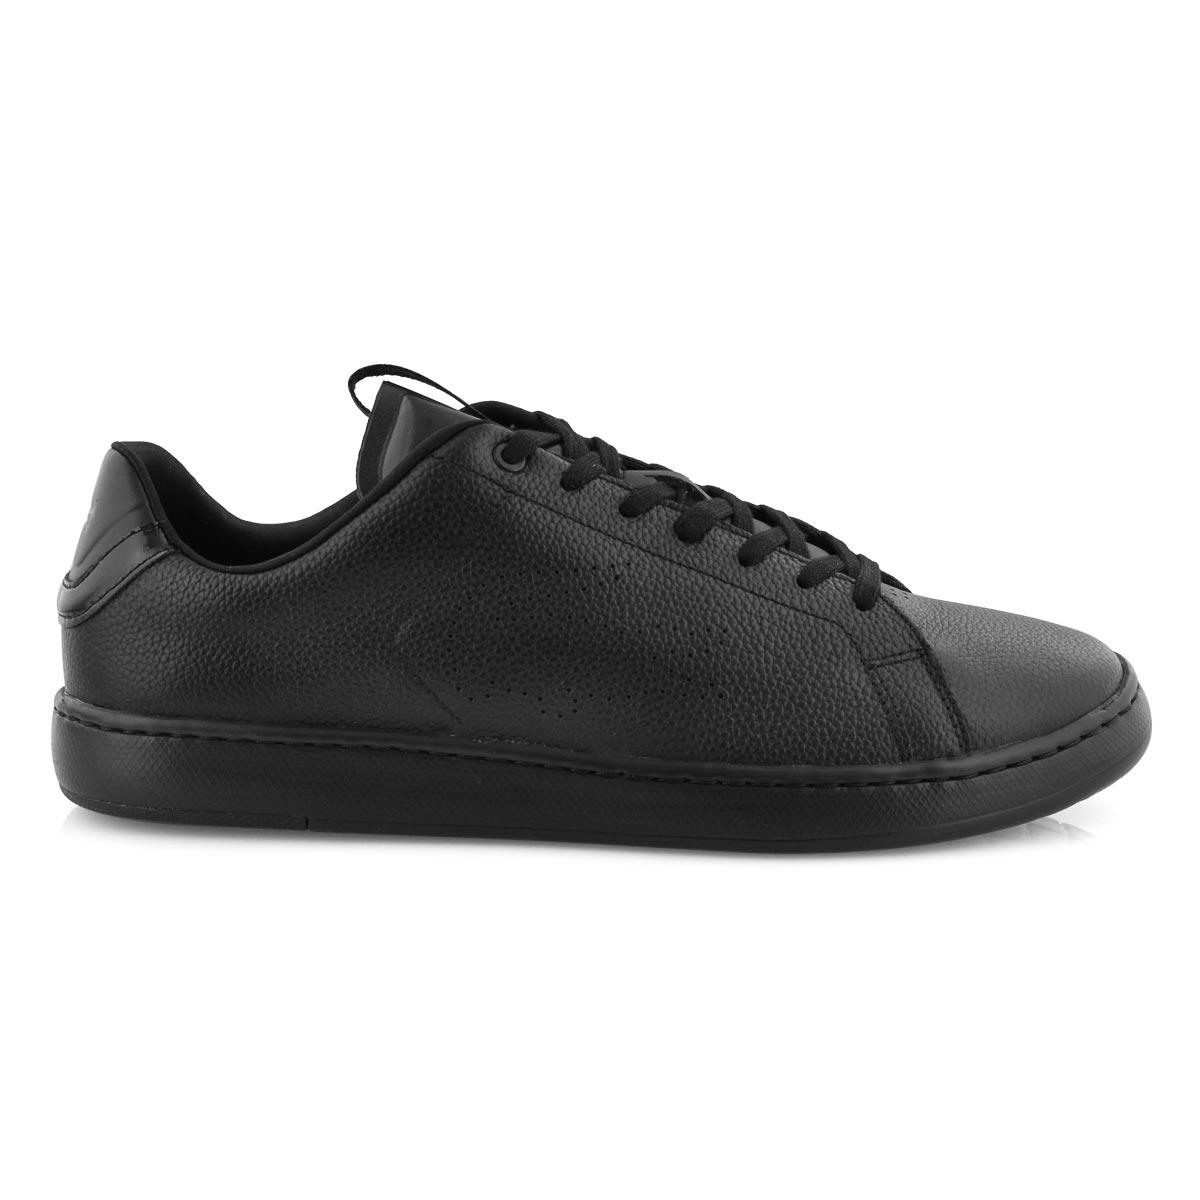 Men's Carnaby EVO 319 1 Fashion Sneaker - Black